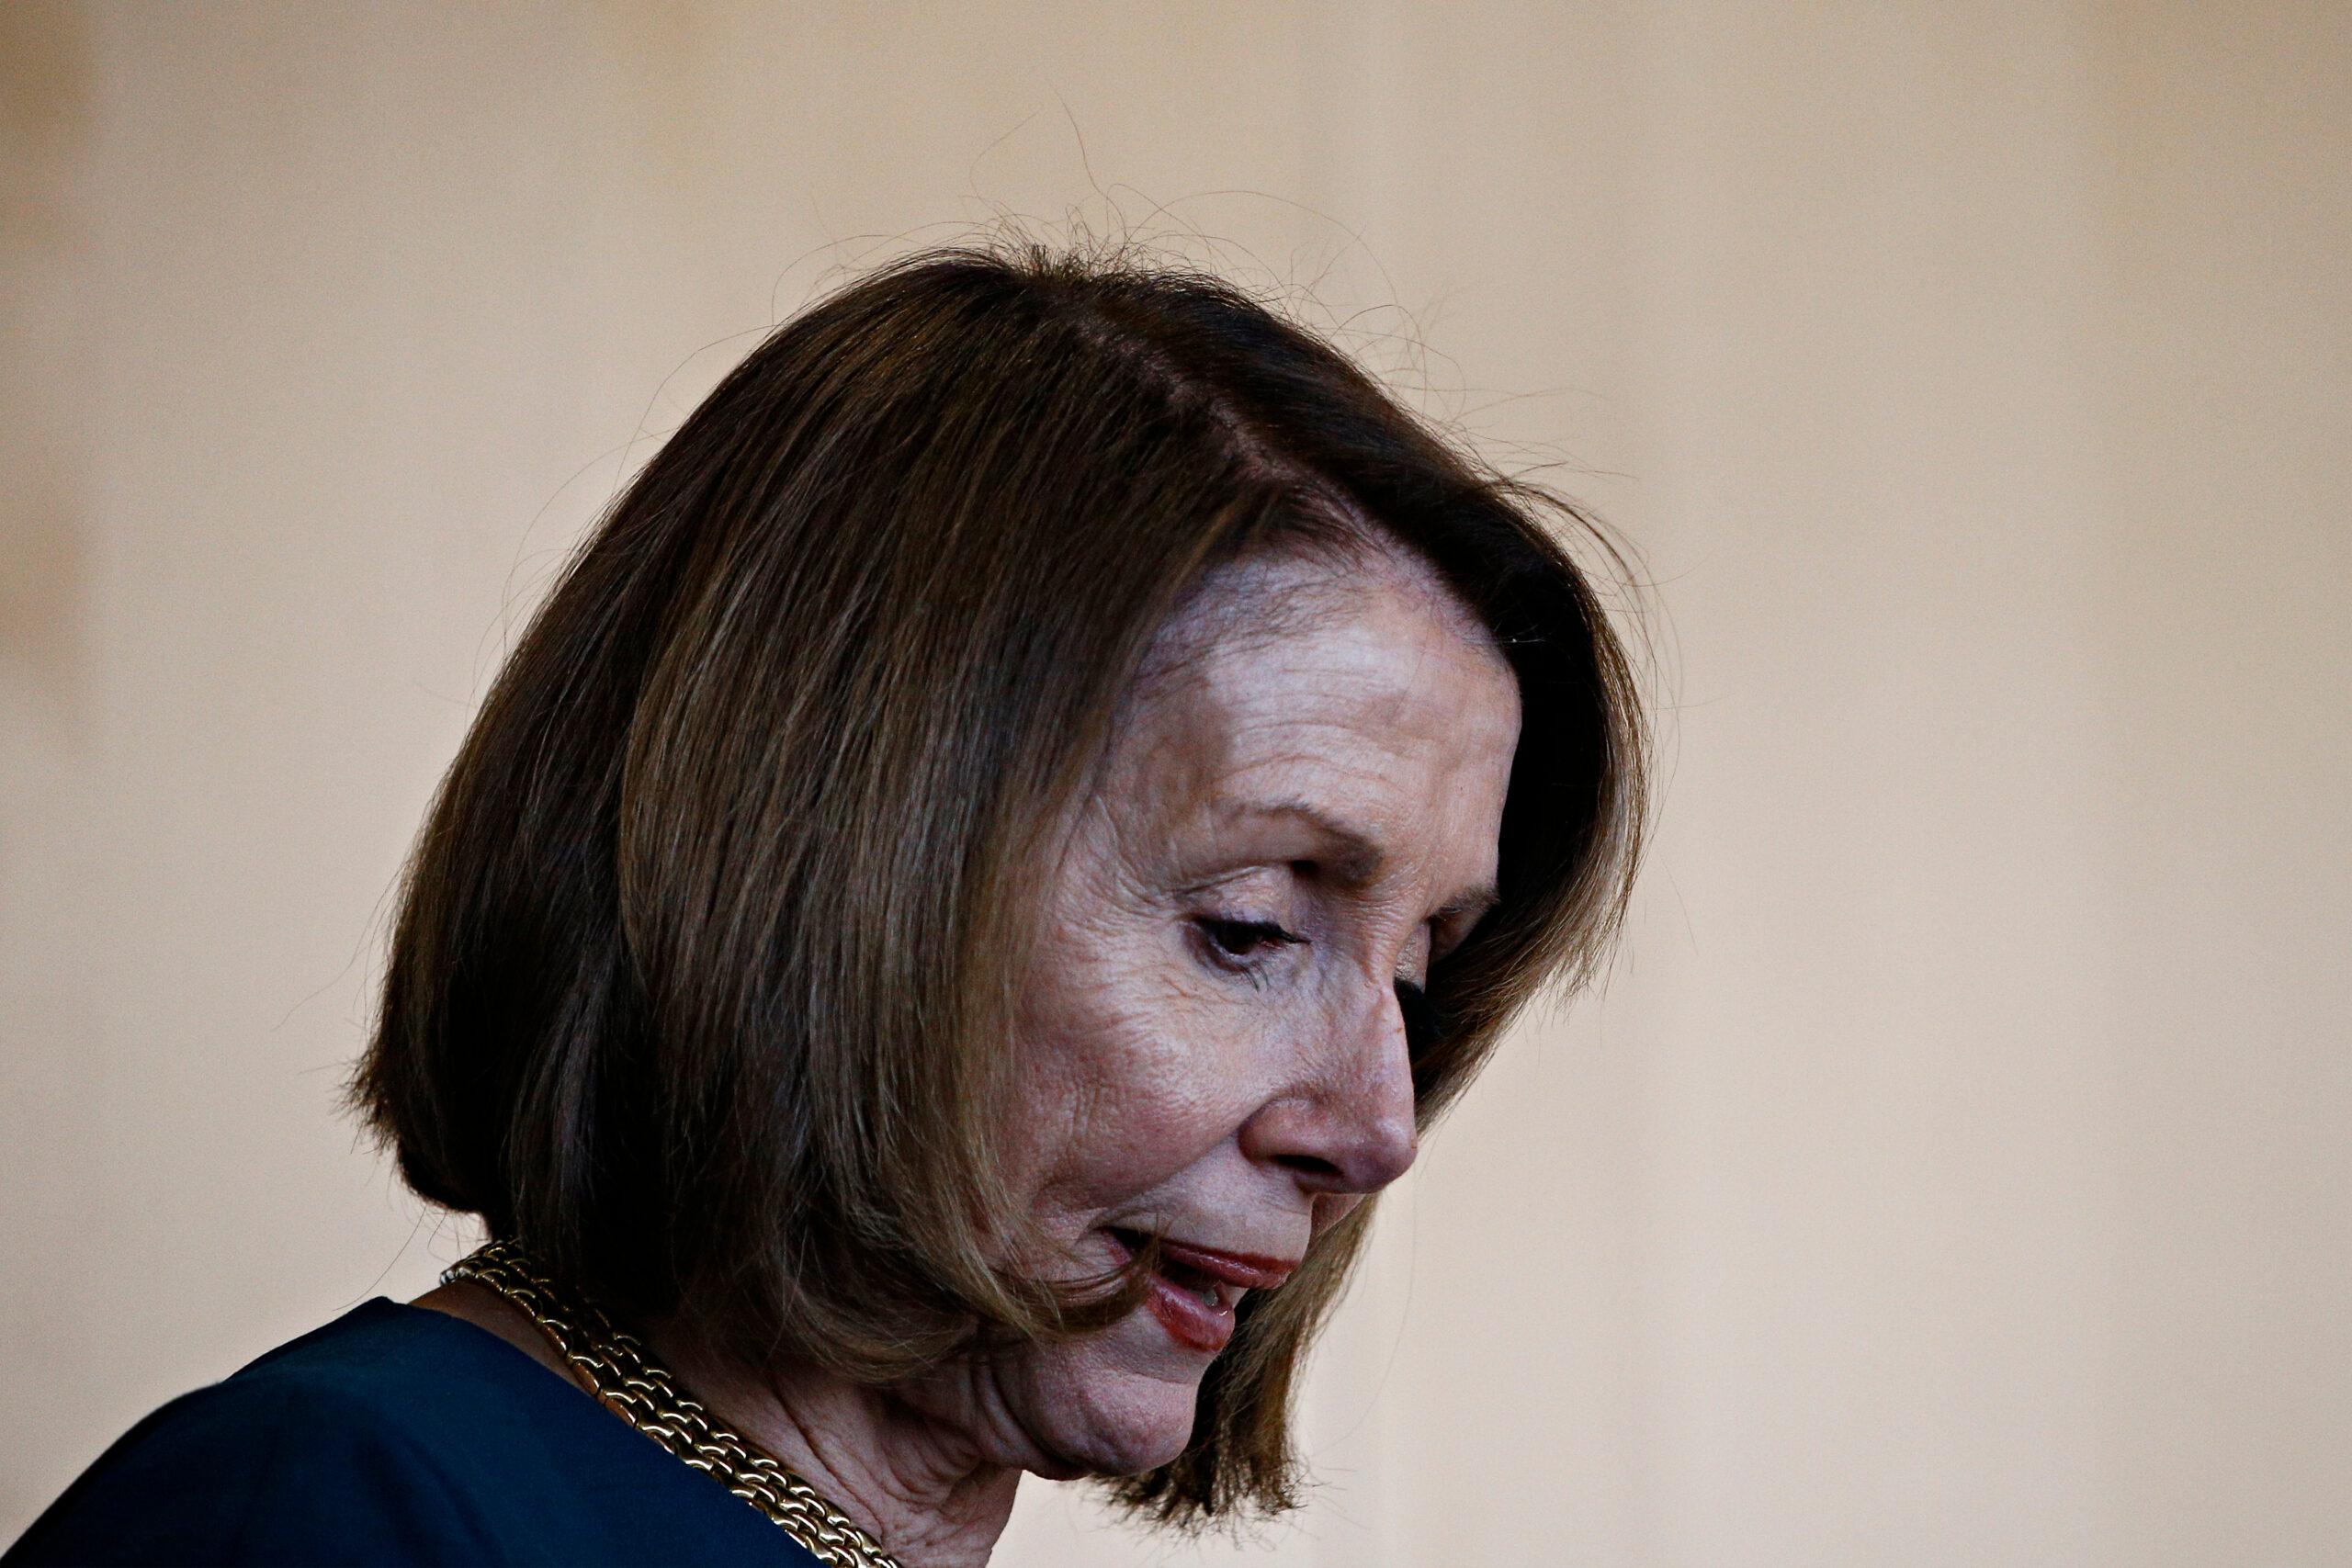 Democrats Have No Shame 🤦